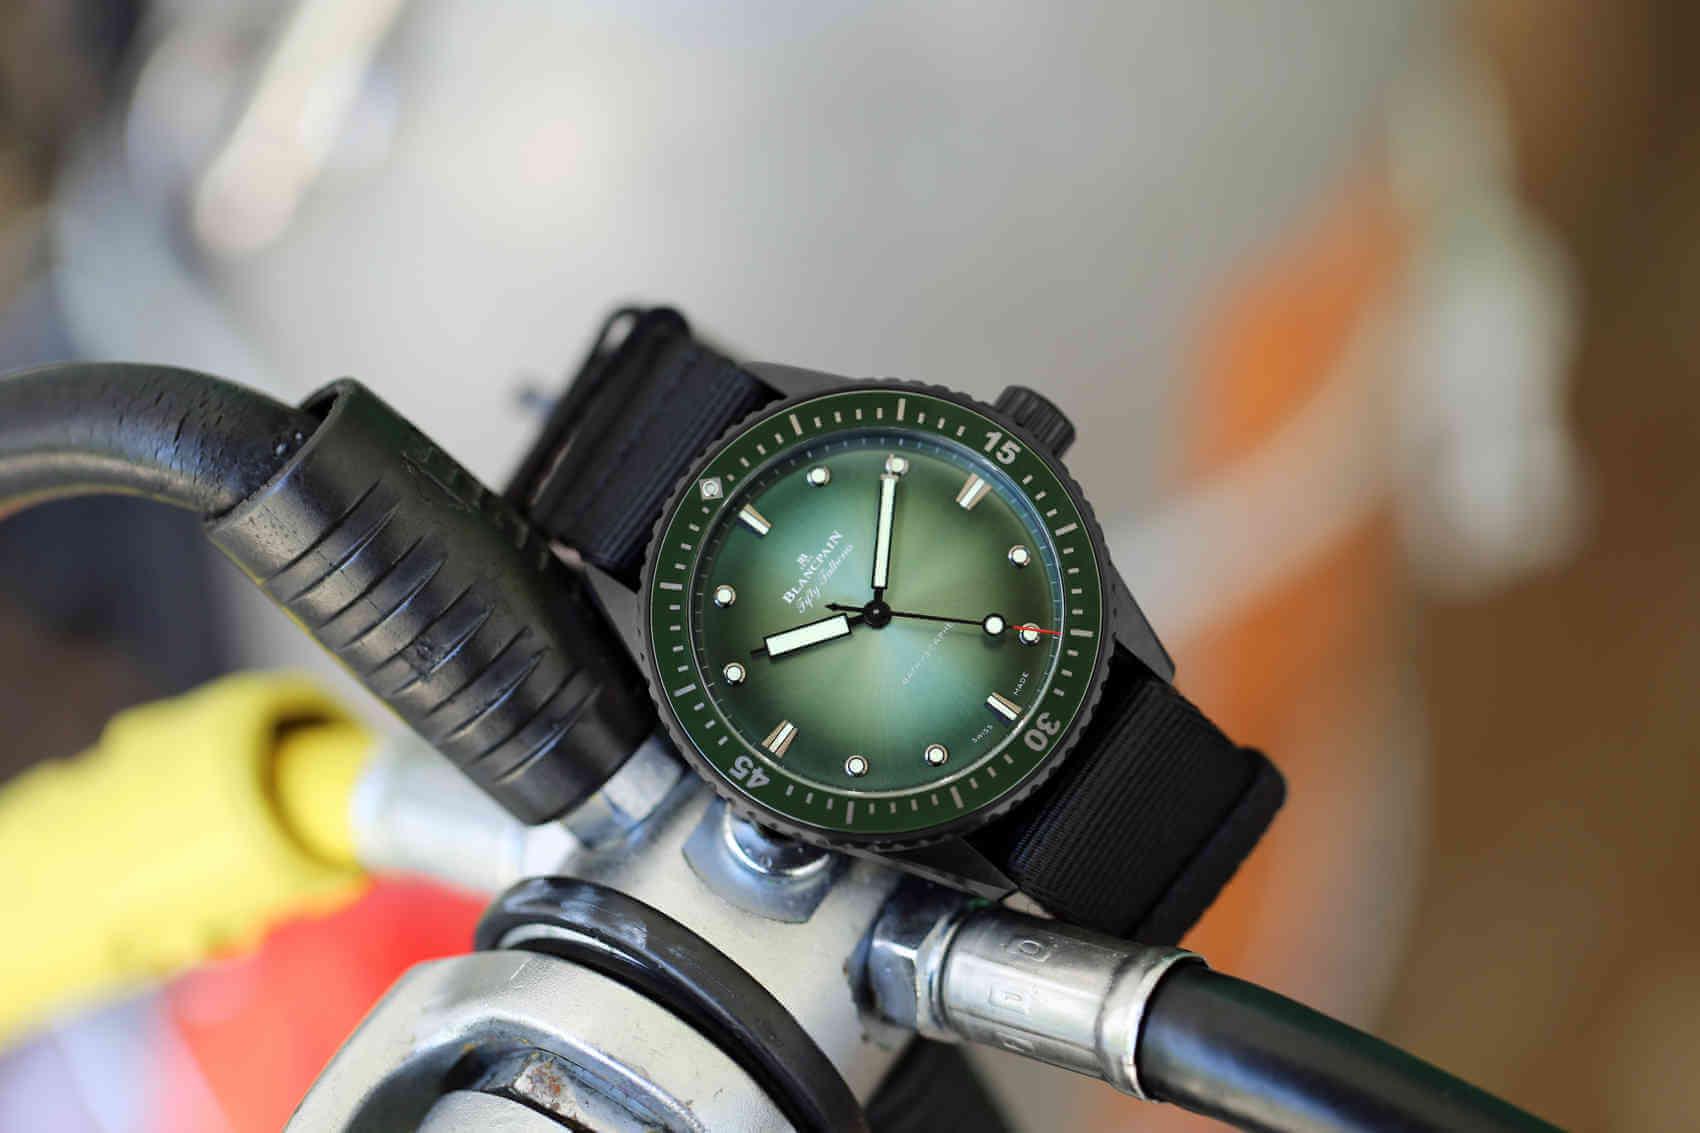 Blancpain Bathyscaphe Mokarran Limited Edition diver 2